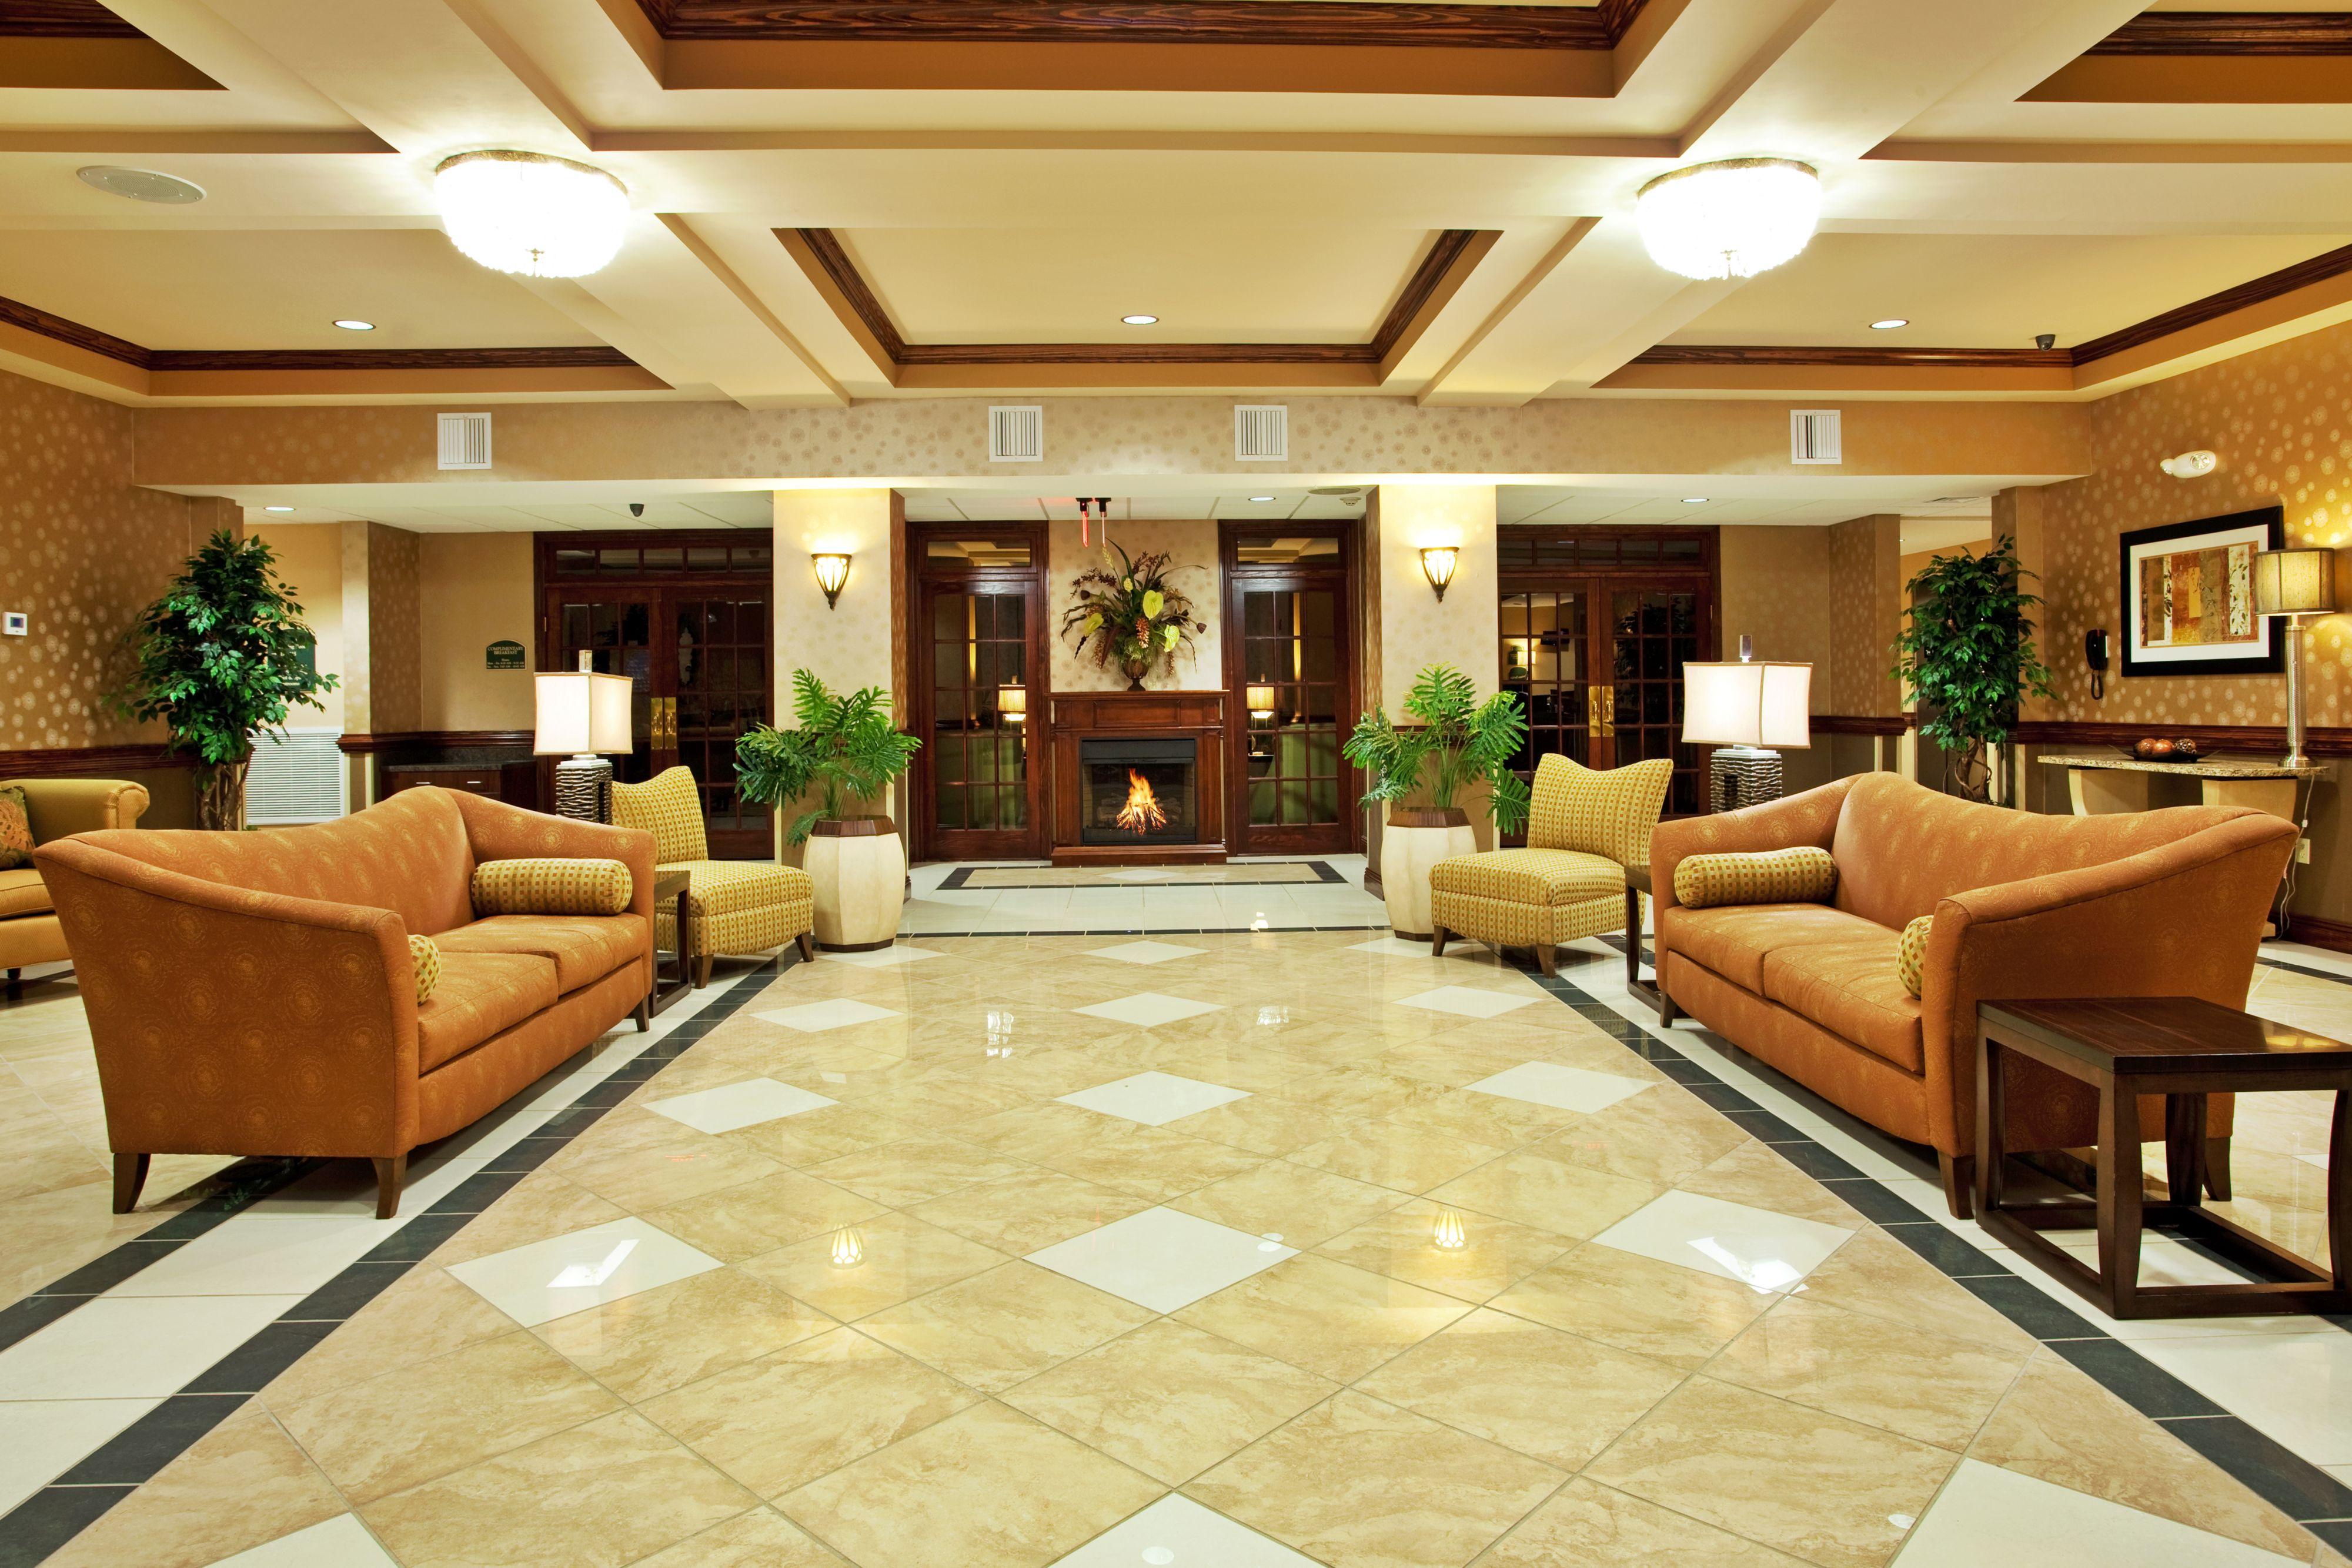 Holiday Inn Express & Suites Biloxi- Ocean Springs image 5